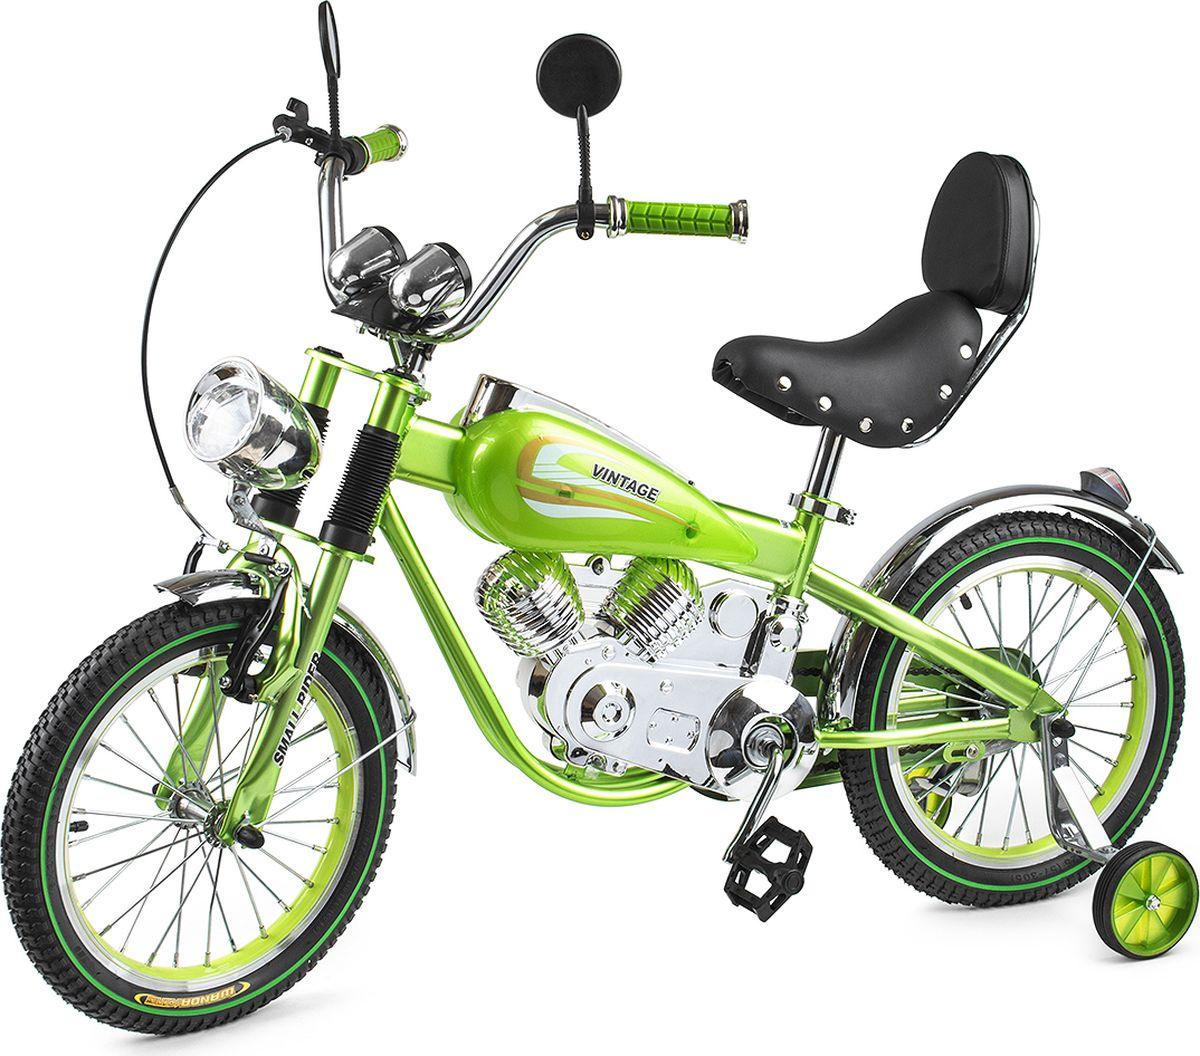 Small Rider Велосипед-мотоцикл детский Motobike Vintage цвет зеленый